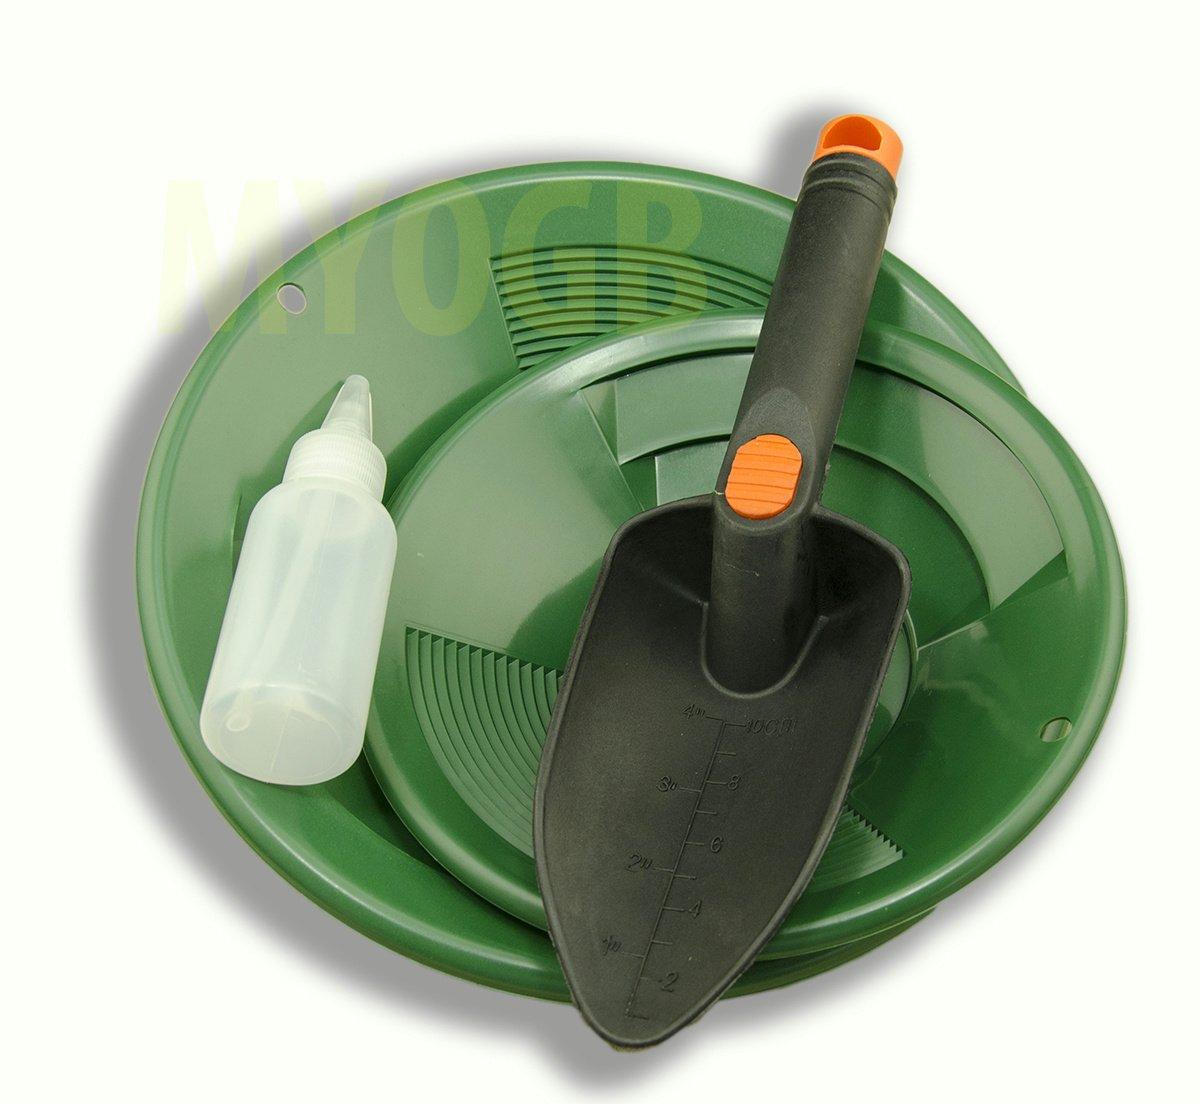 Make Your Own Gold Bars Gold Panning Kit 10'' & 8'' Green Pans Bottle Snuffer & Scoop-Mining Prospecting